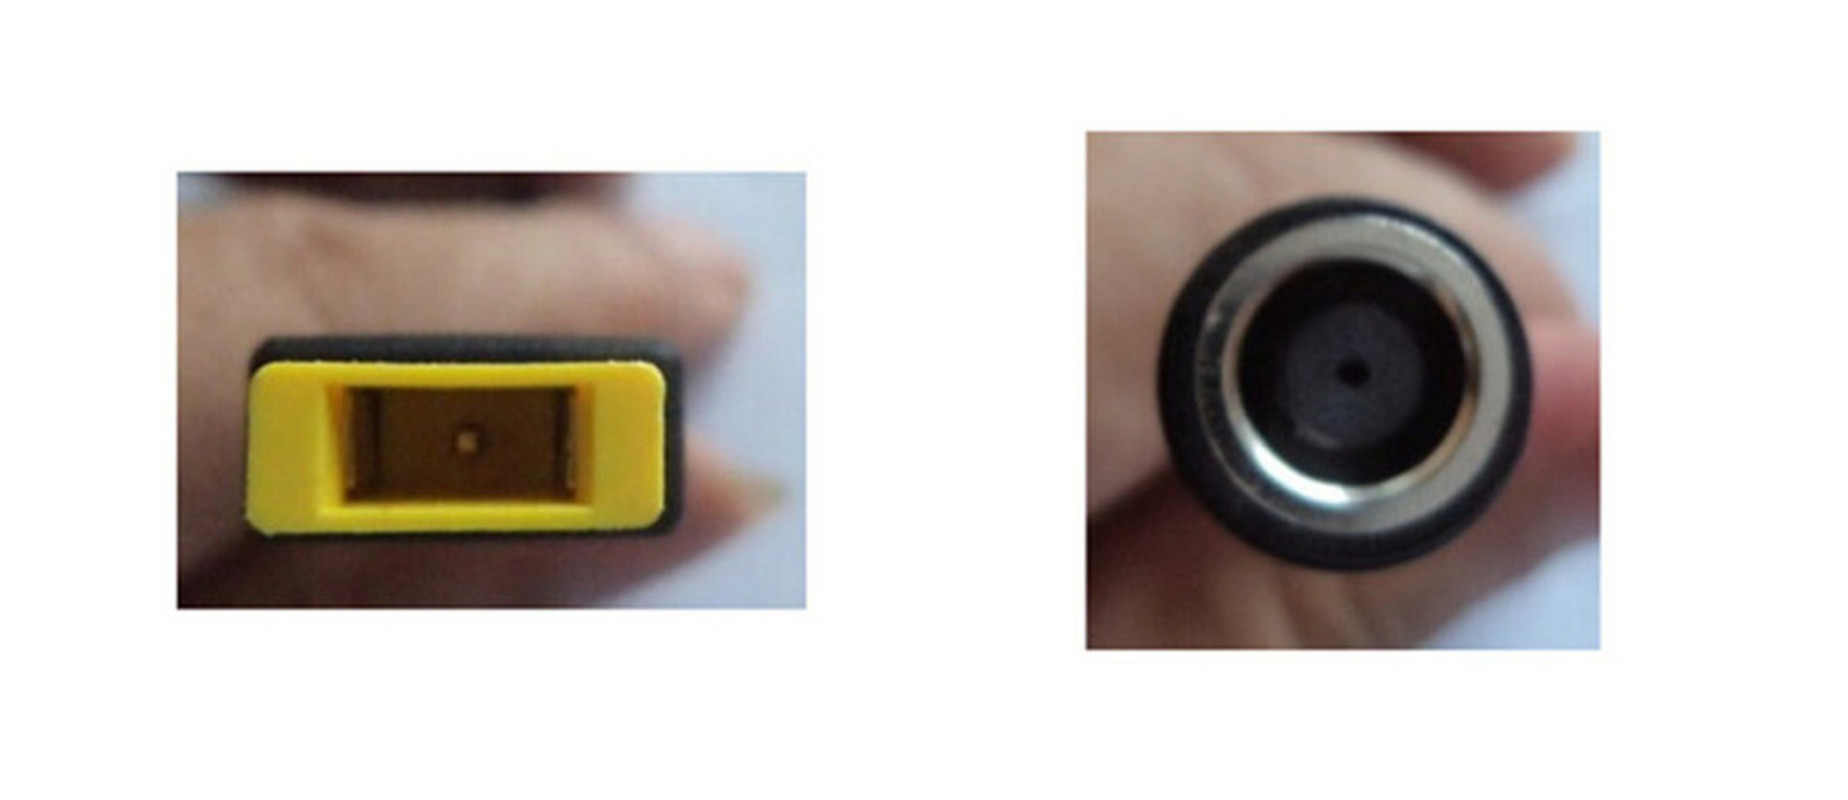 Cable conversor adaptador de corriente para IBM JRGK 7,9*5,5mm conector redondo a enchufe cuadrado adaptador de extremo cargador de coleta para Lenovo Thinkpad